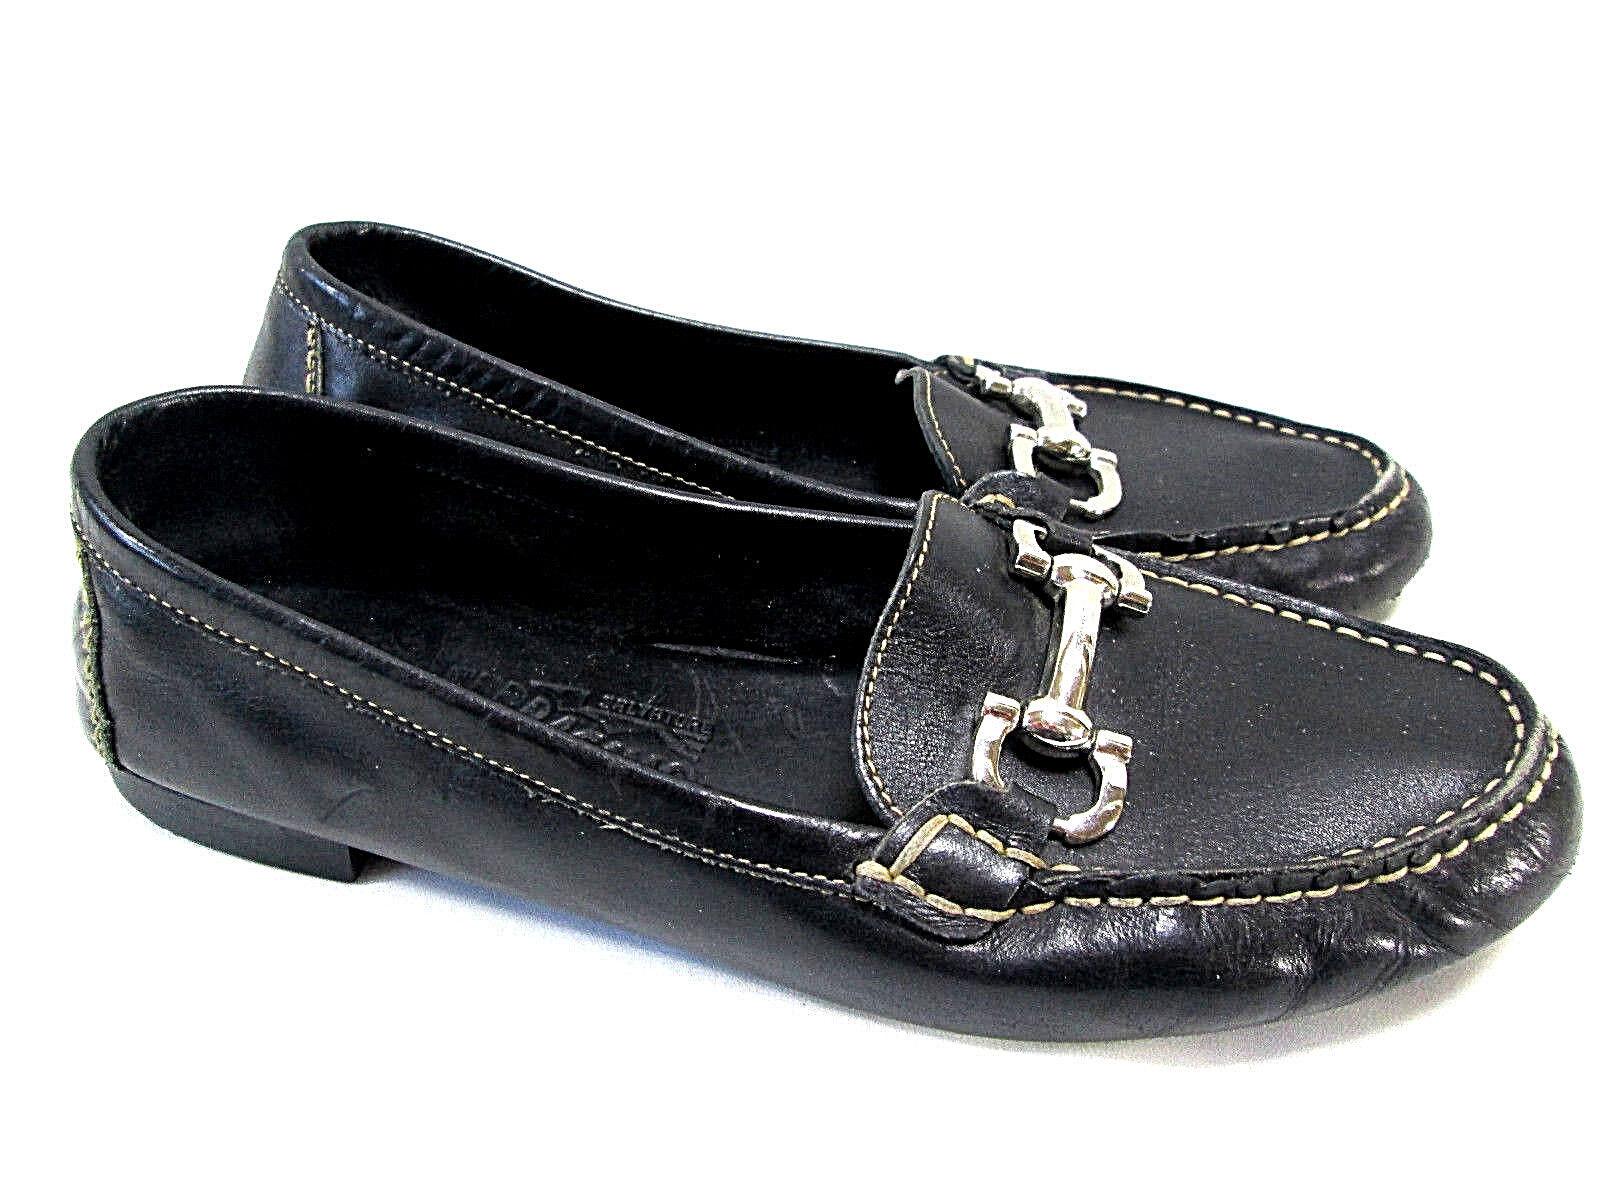 SALVATORE FERRAGAMO Parigi Gancini Bit Driver Moccasin Women 7 Soft Black Loafer